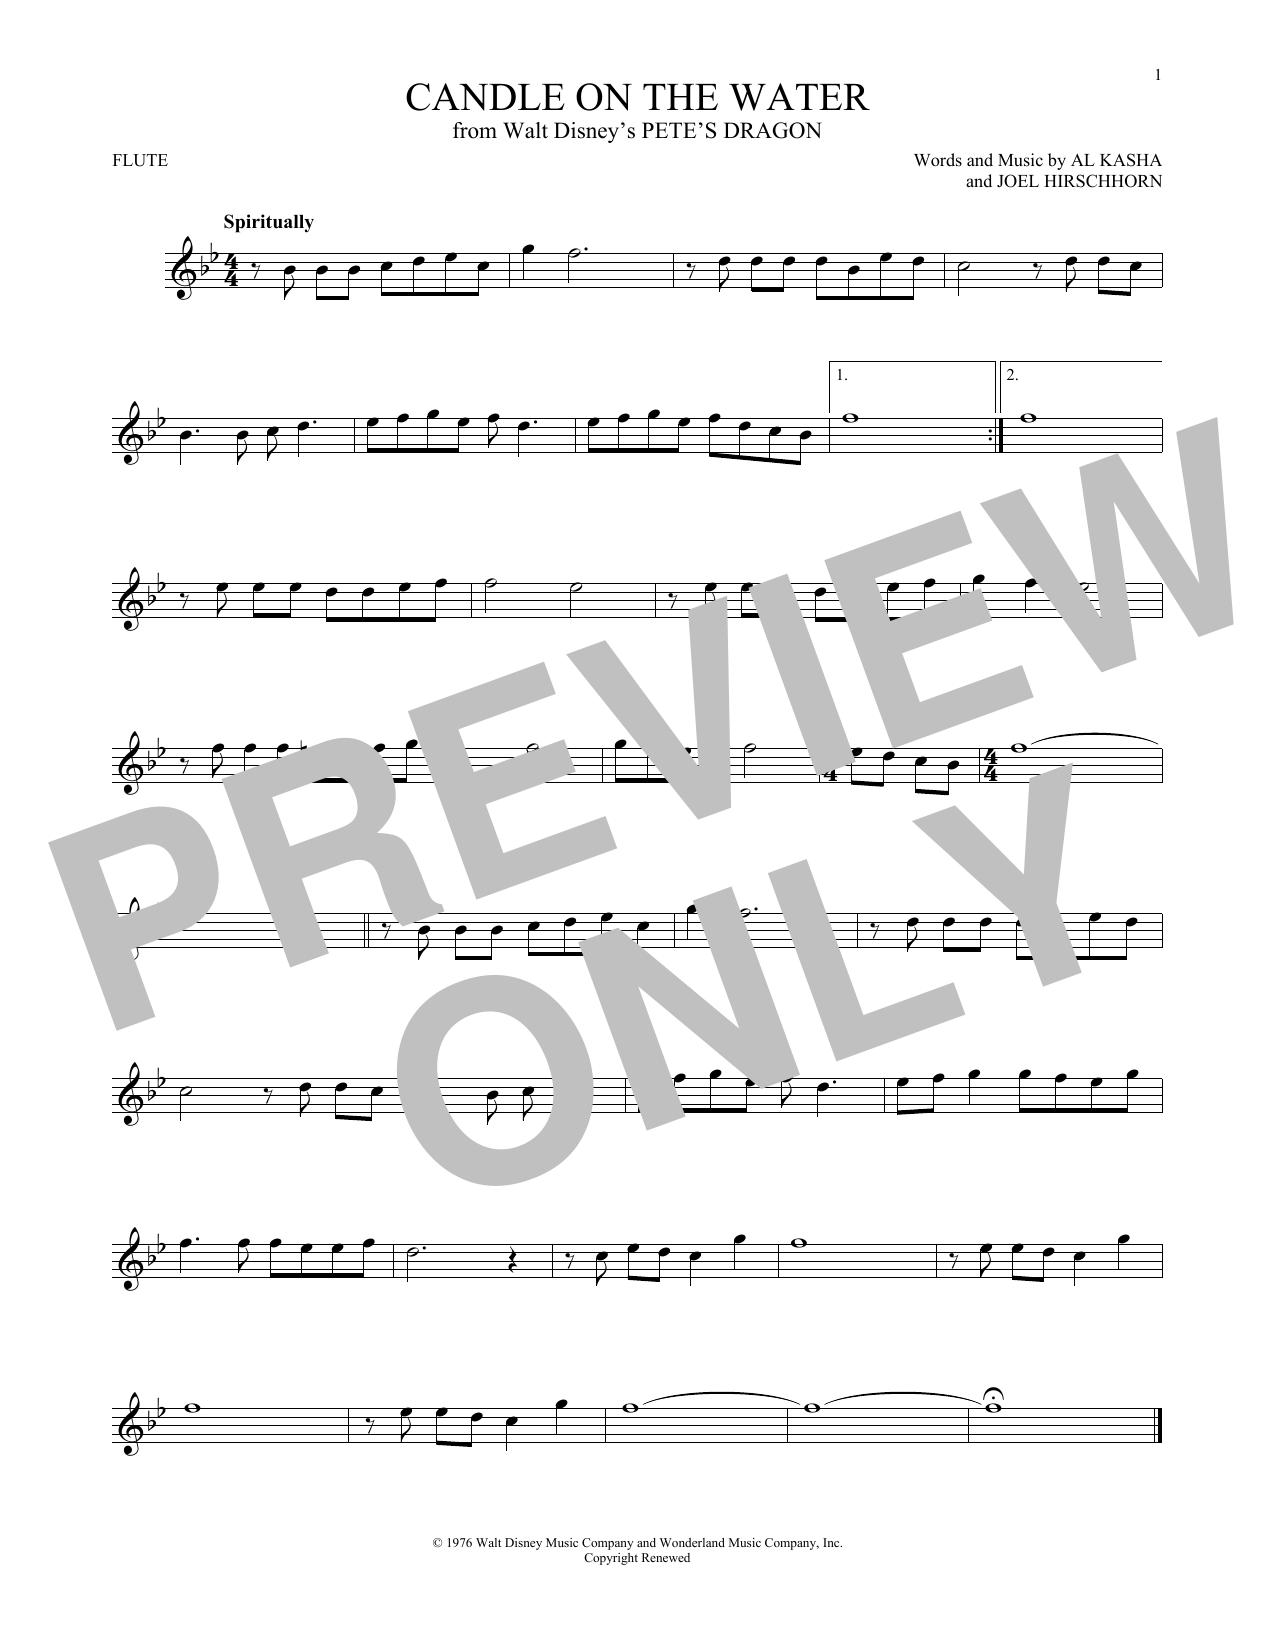 Partition flûte Candle On The Water (from Walt Disney's Pete's Dragon) de Kasha & Hirschhorn - Flute traversiere